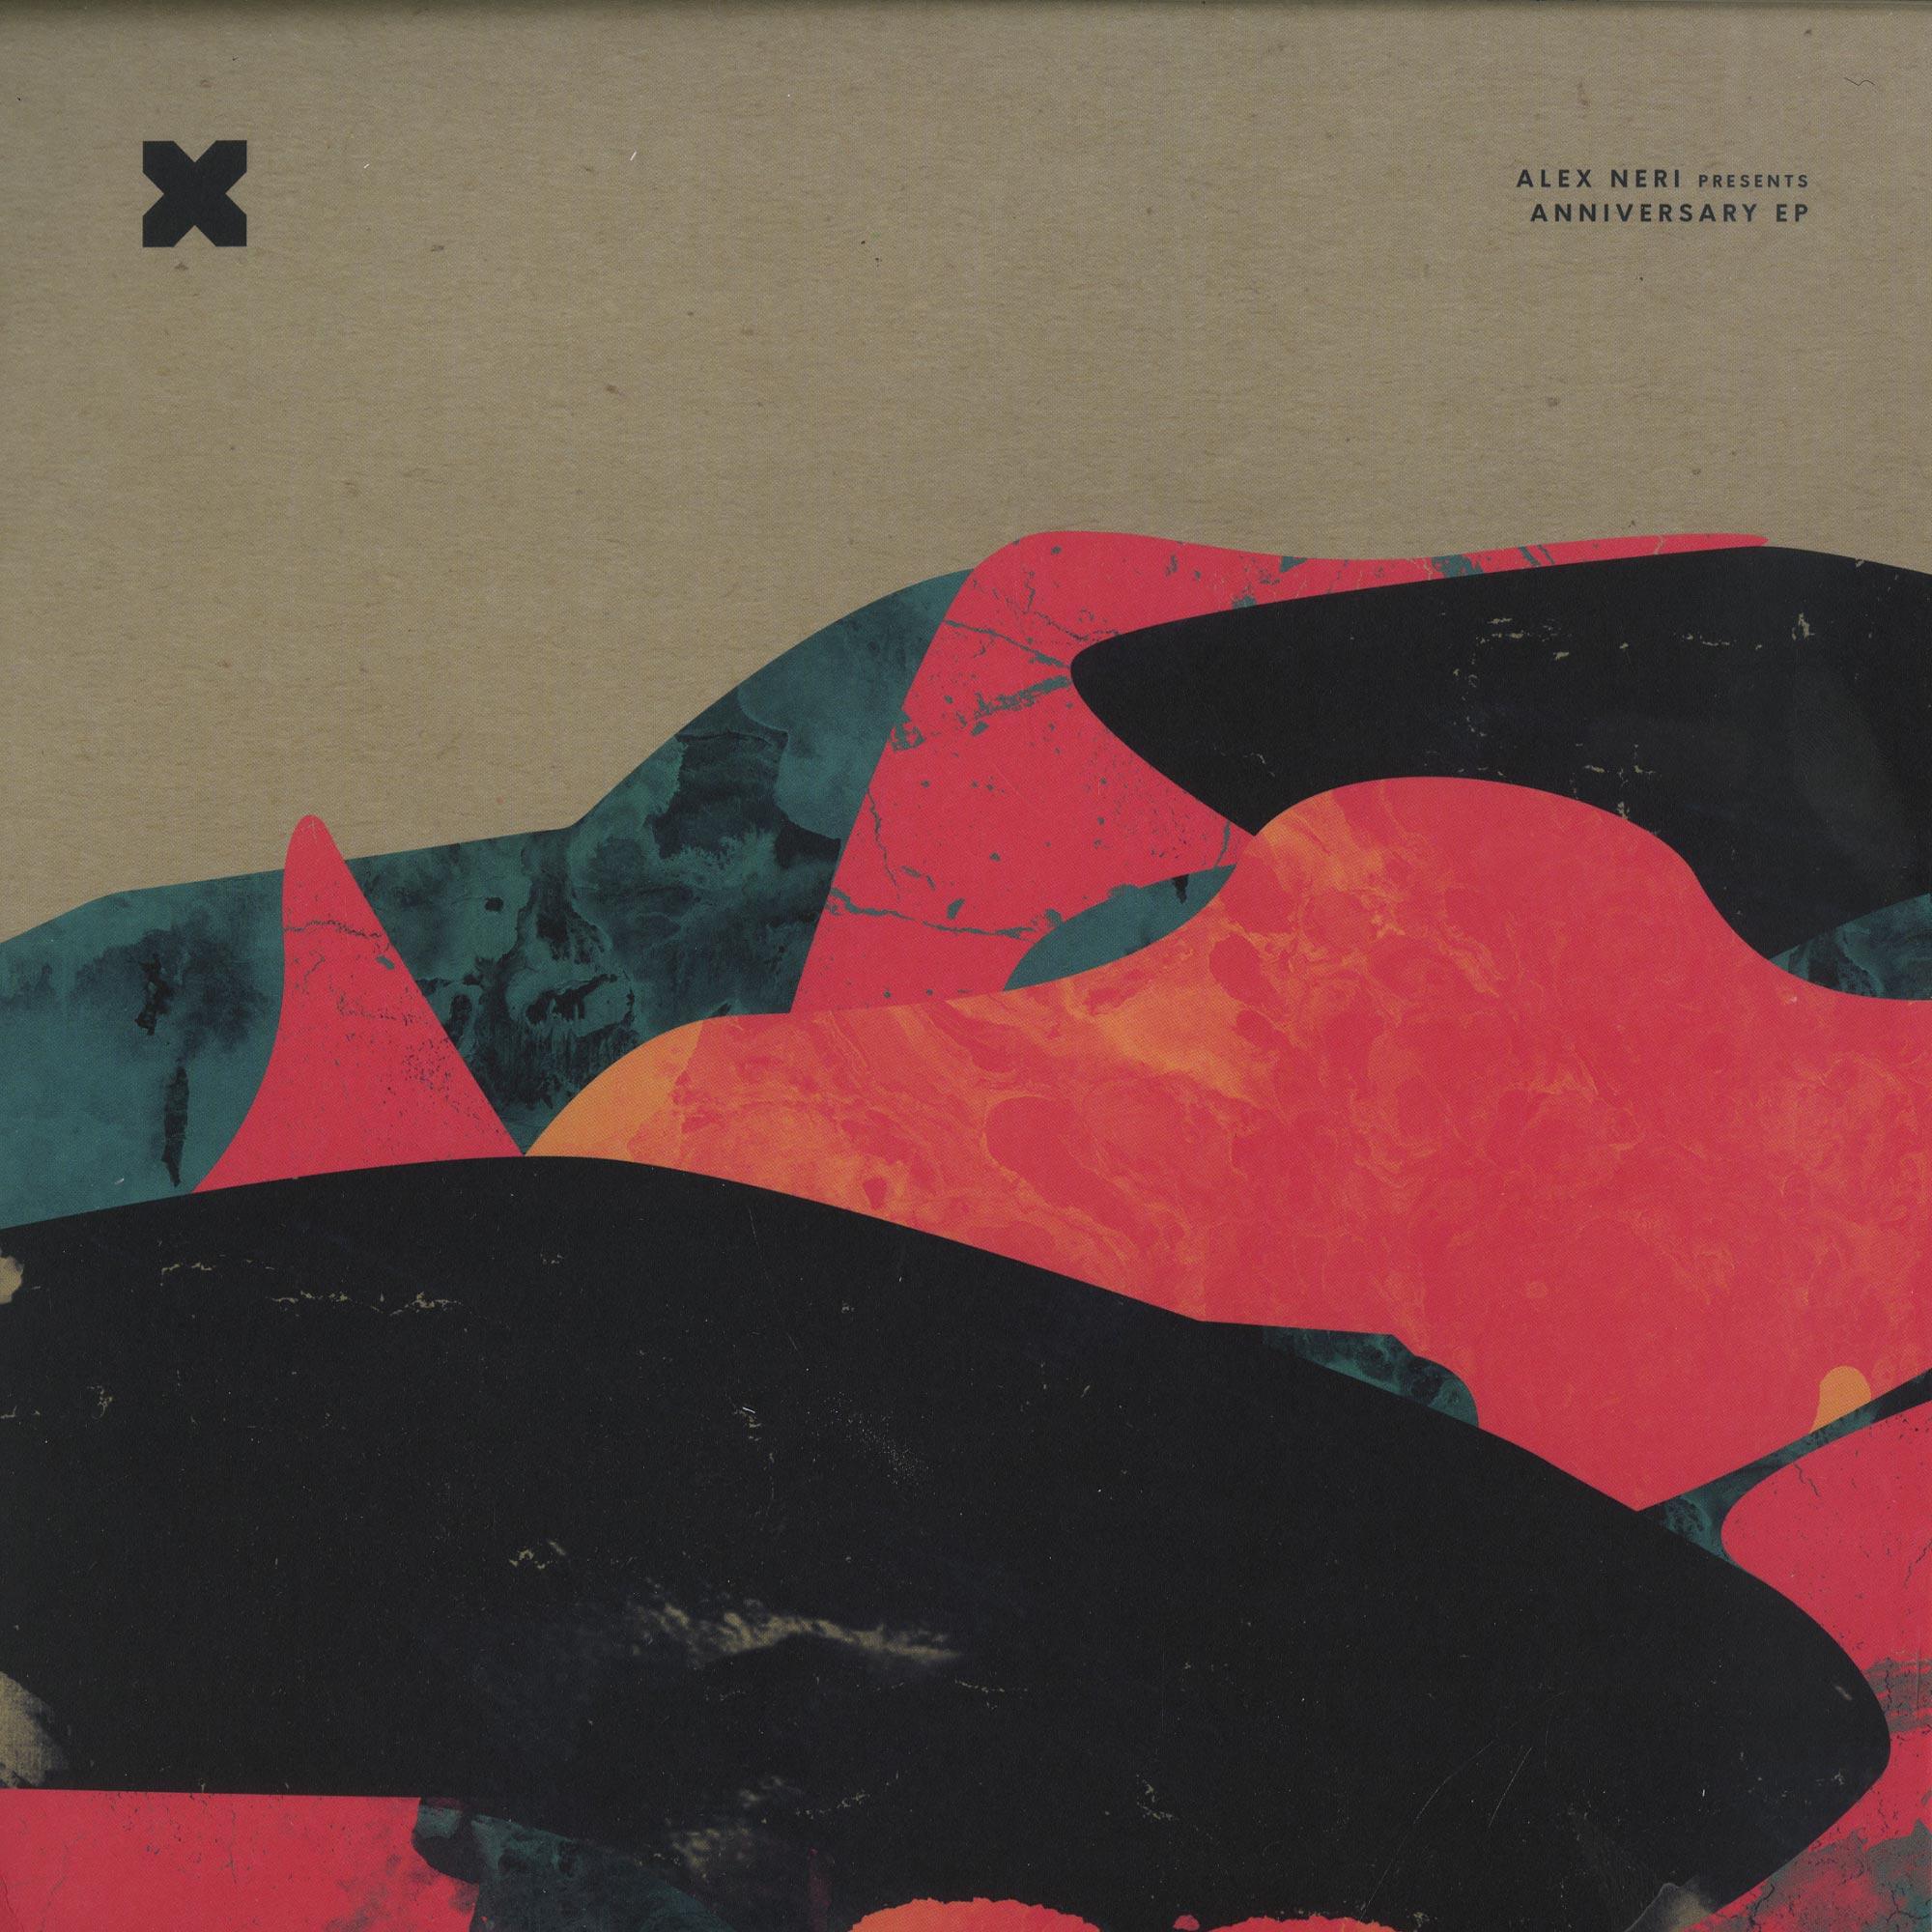 Alex Neri - ANNIVERSARY EP